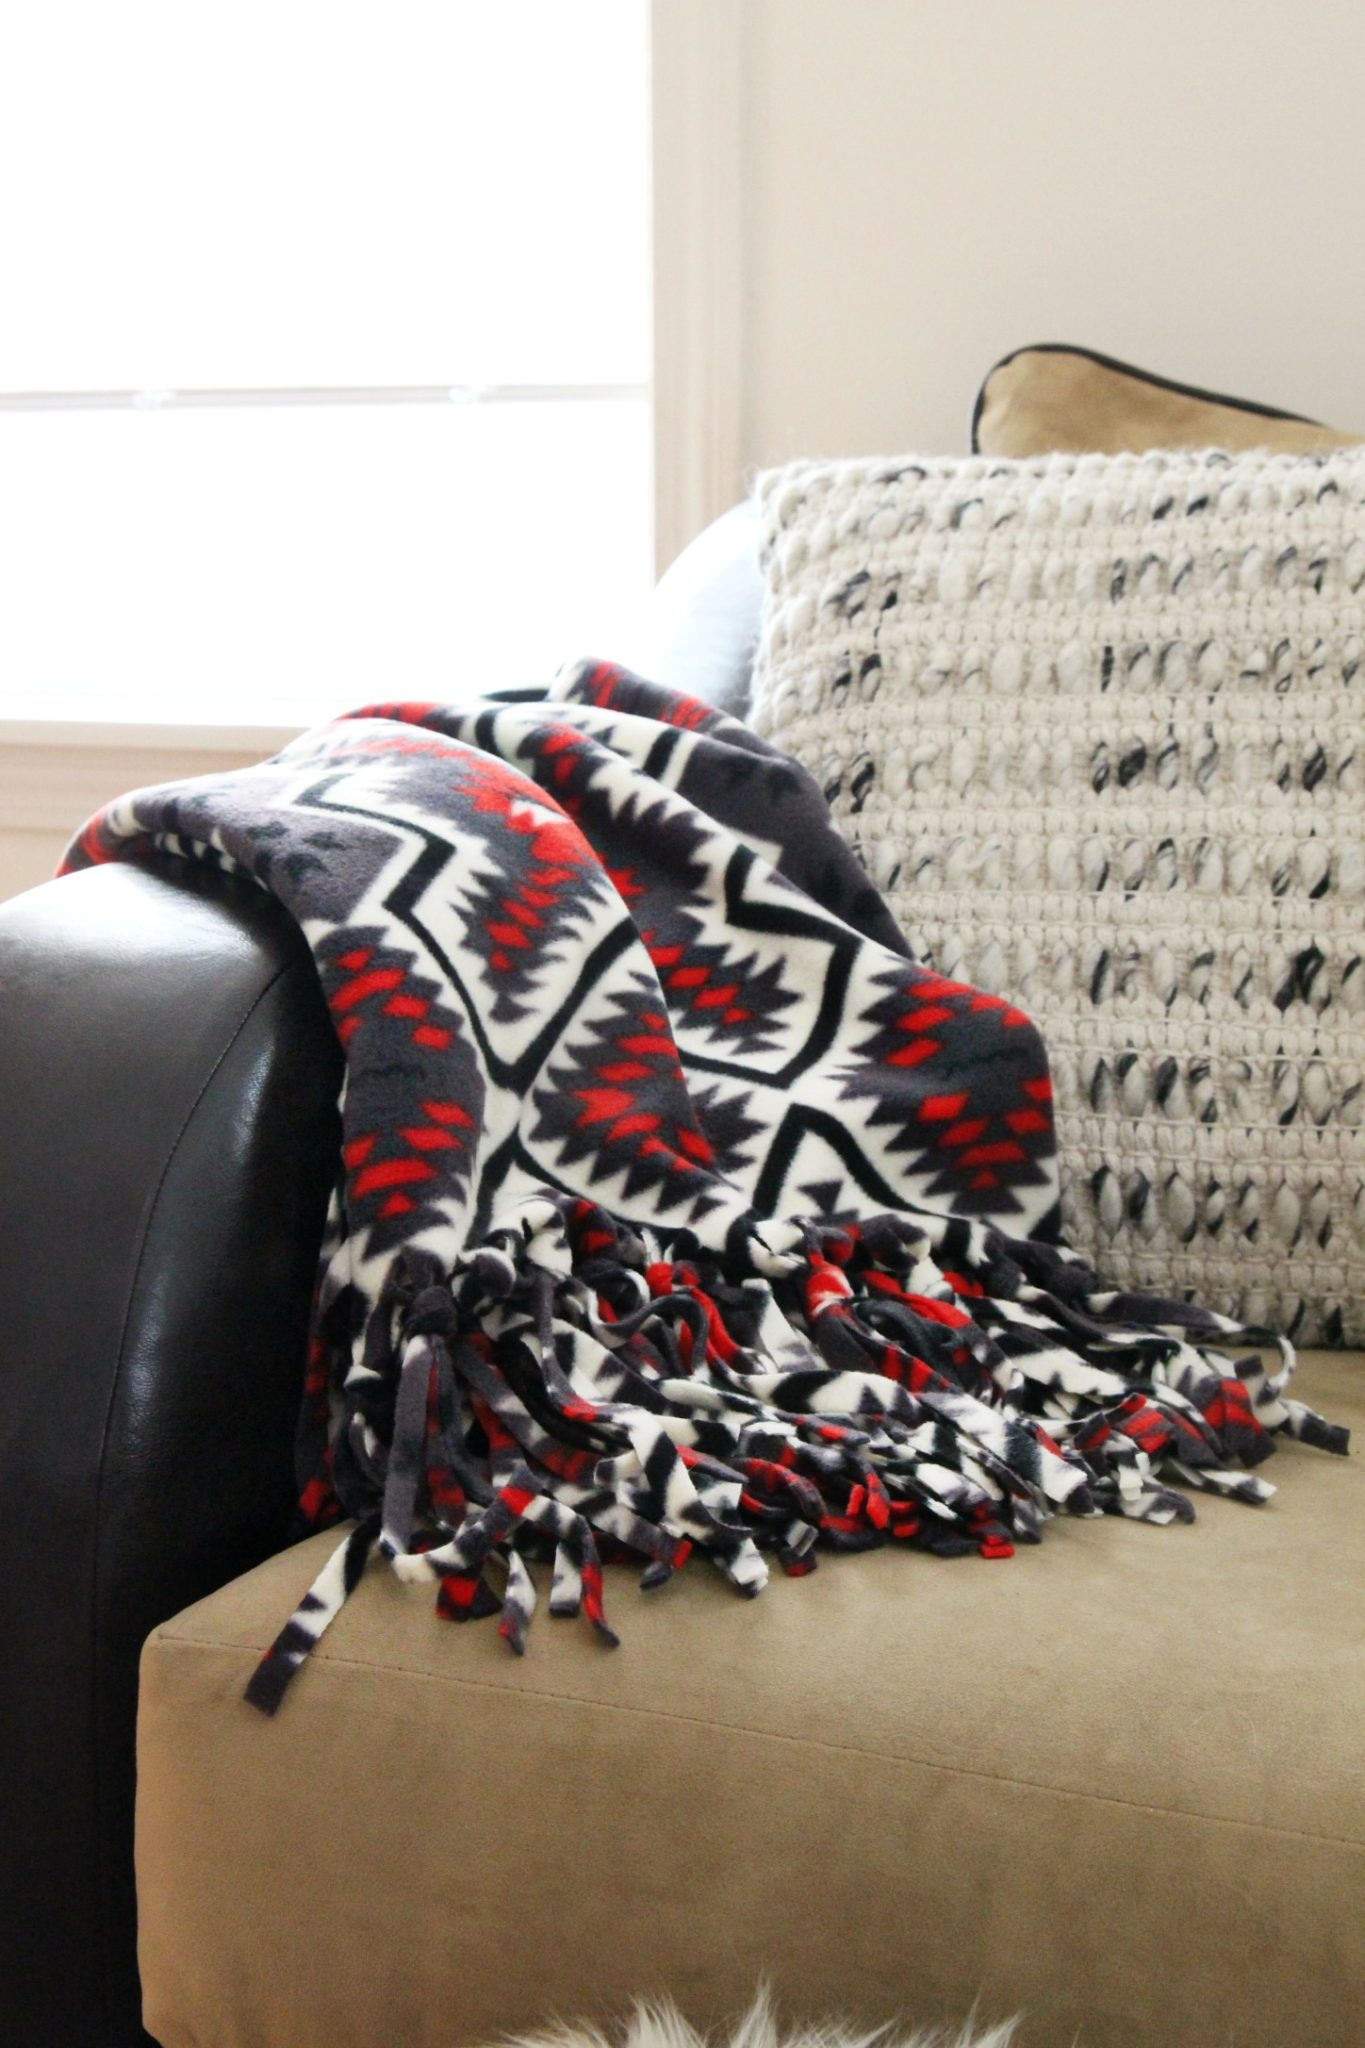 How to Make a Cozy, No Sew Throw Blanket Tutorial | DIY Fleece Blanket